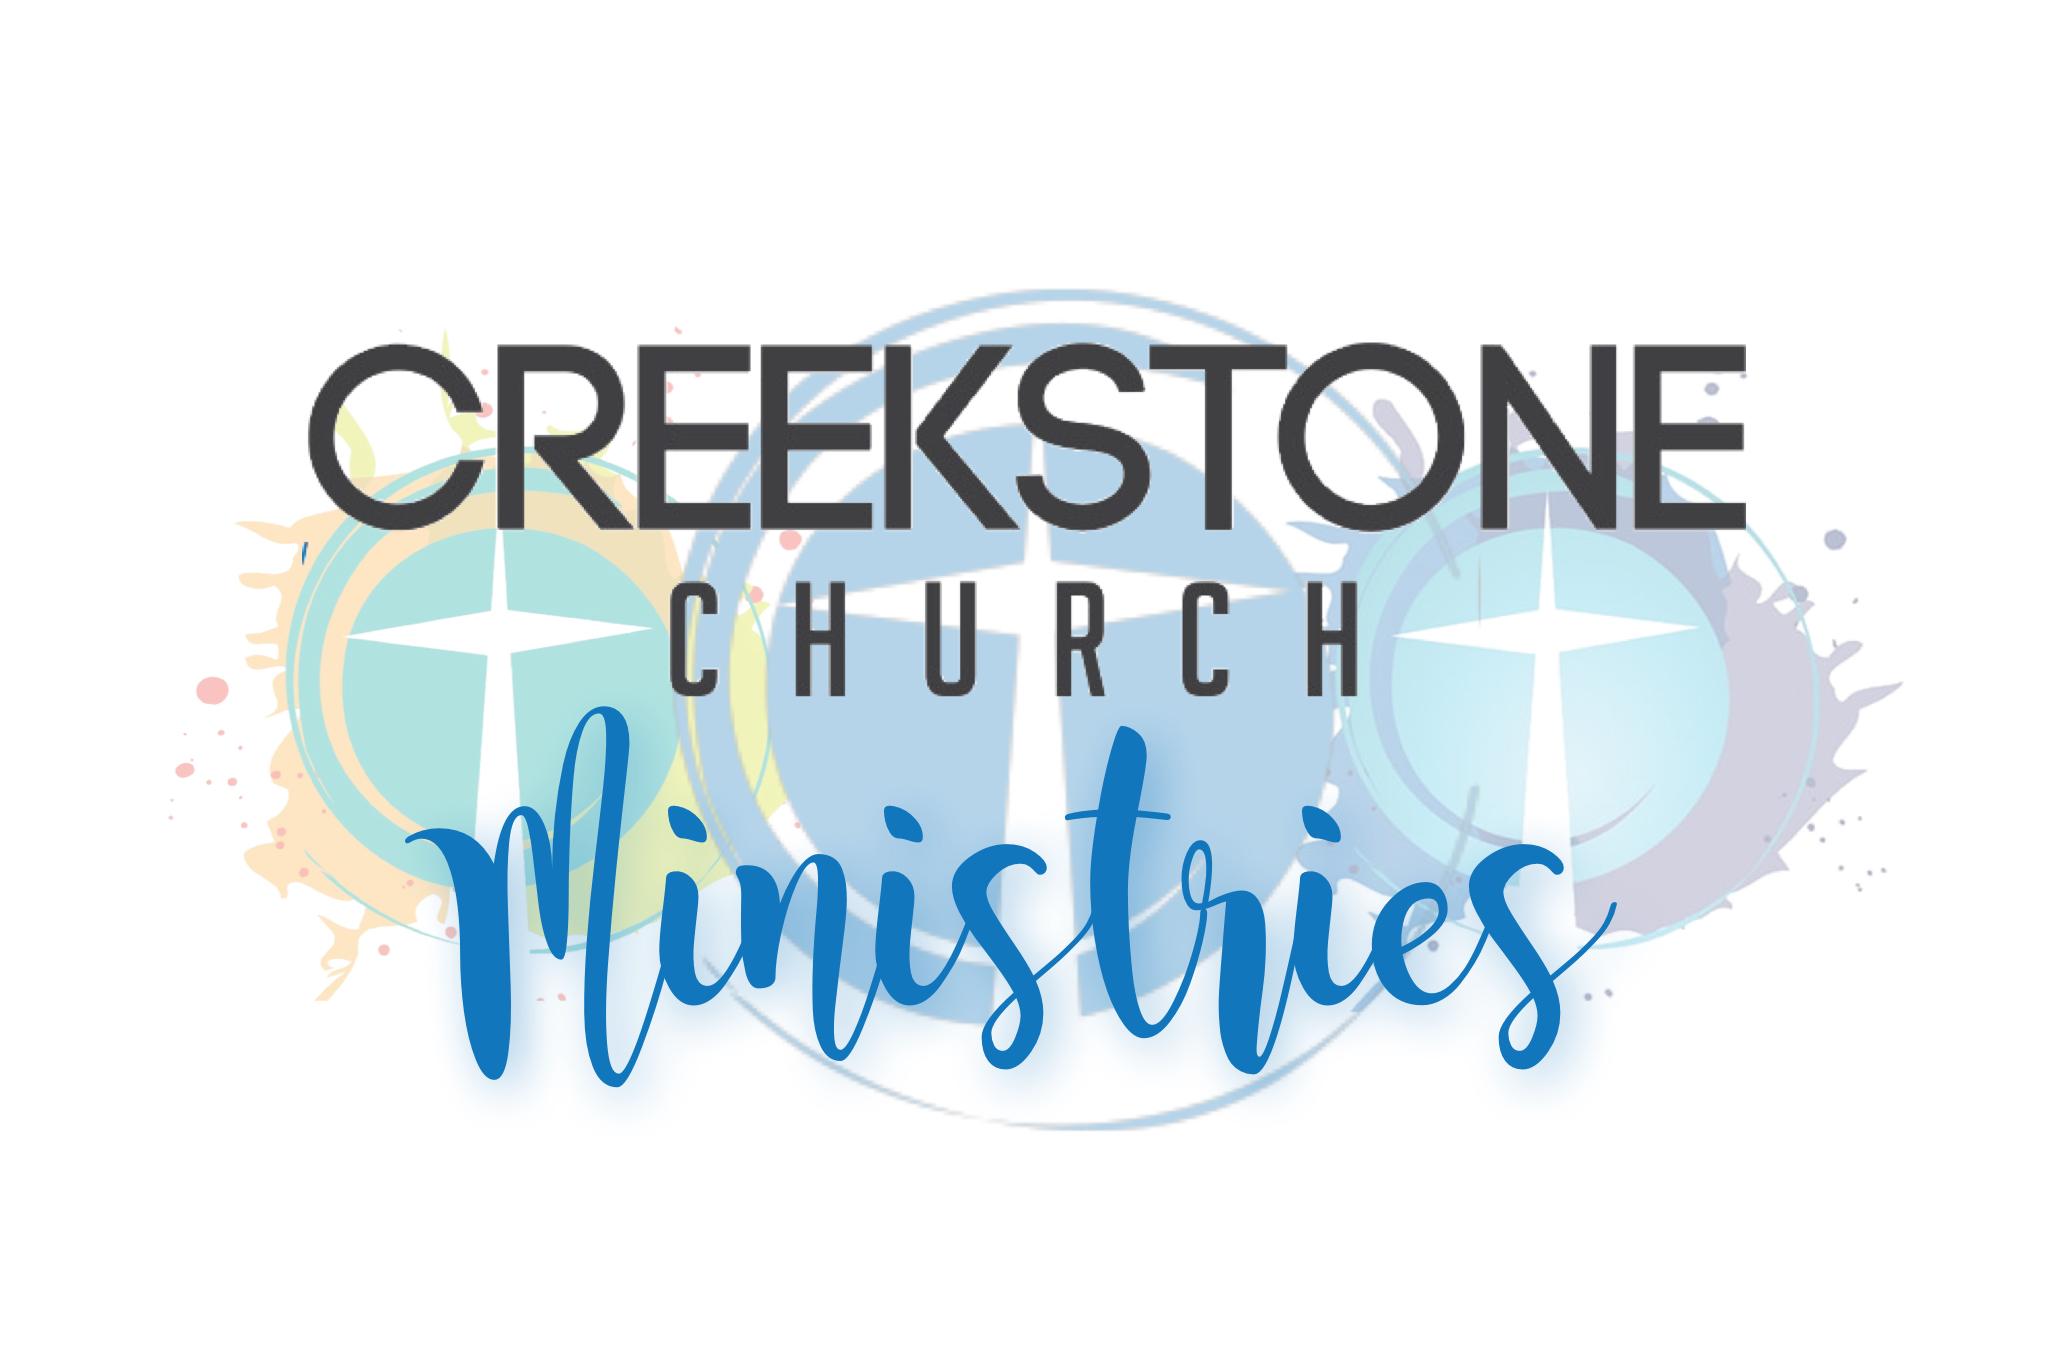 Creekstone-Church-Ministries.jpeg